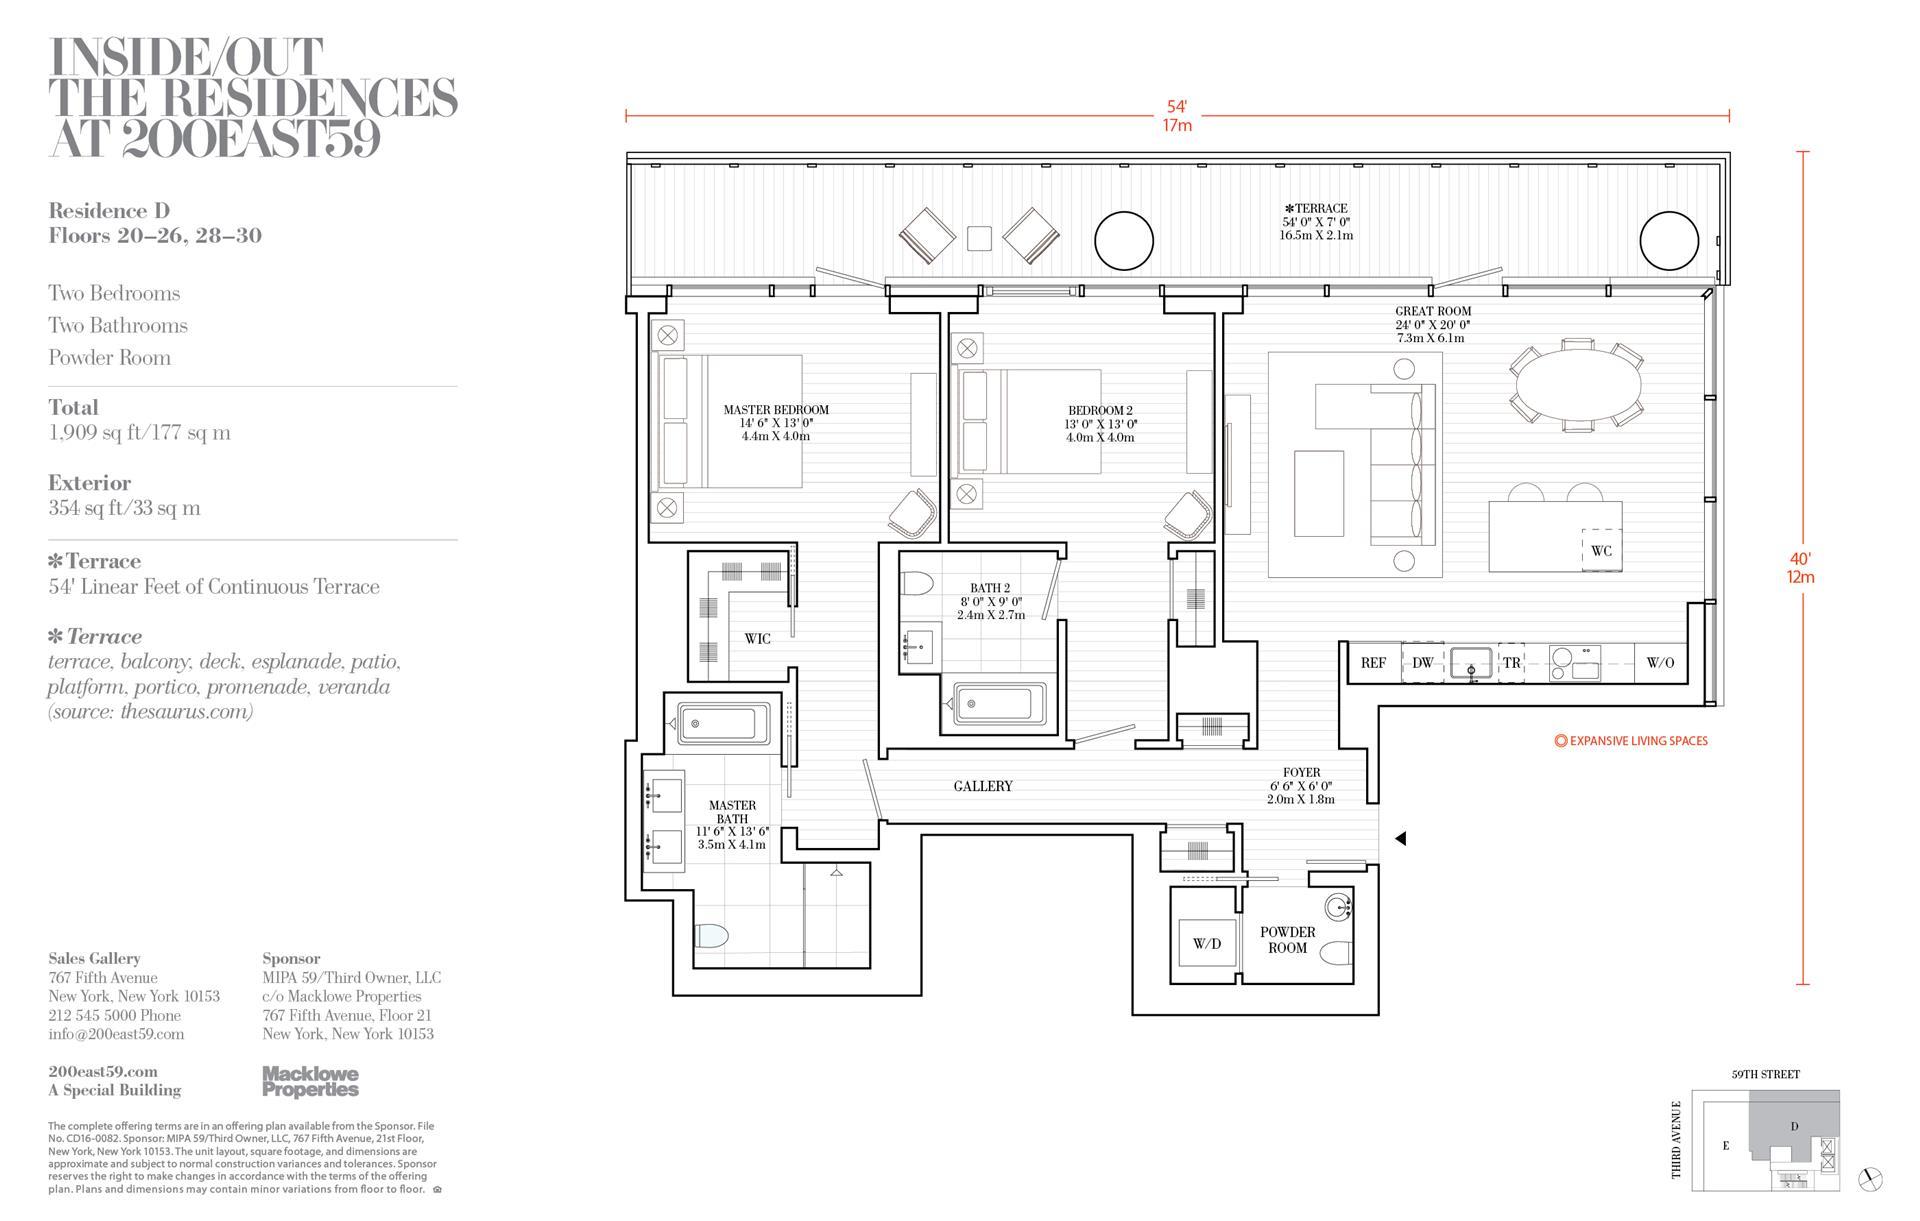 Floor plan of 200 East 59th St, 21D - Midtown, New York